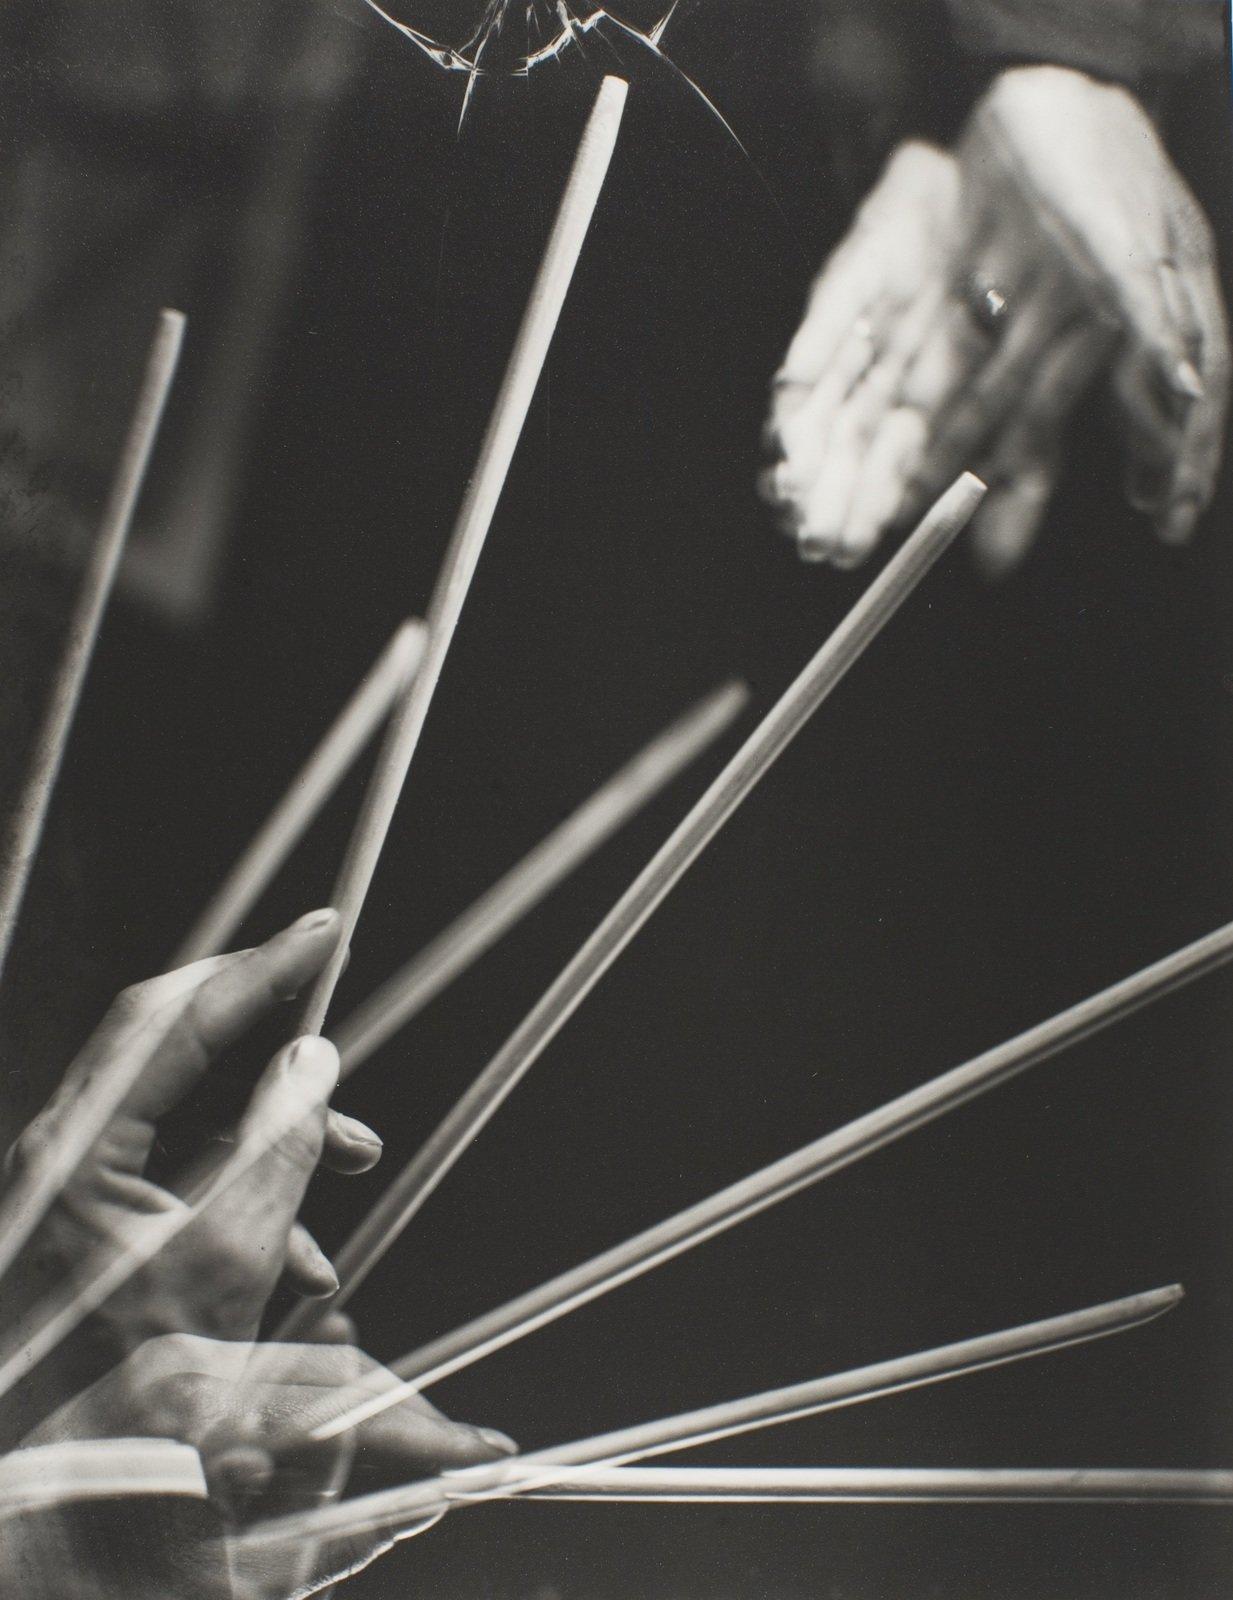 Untitled, 1930-1934, Josep Maria Lladó Bausili , Museu Nacional d'Art de Catalunya, CC BY-NC-ND